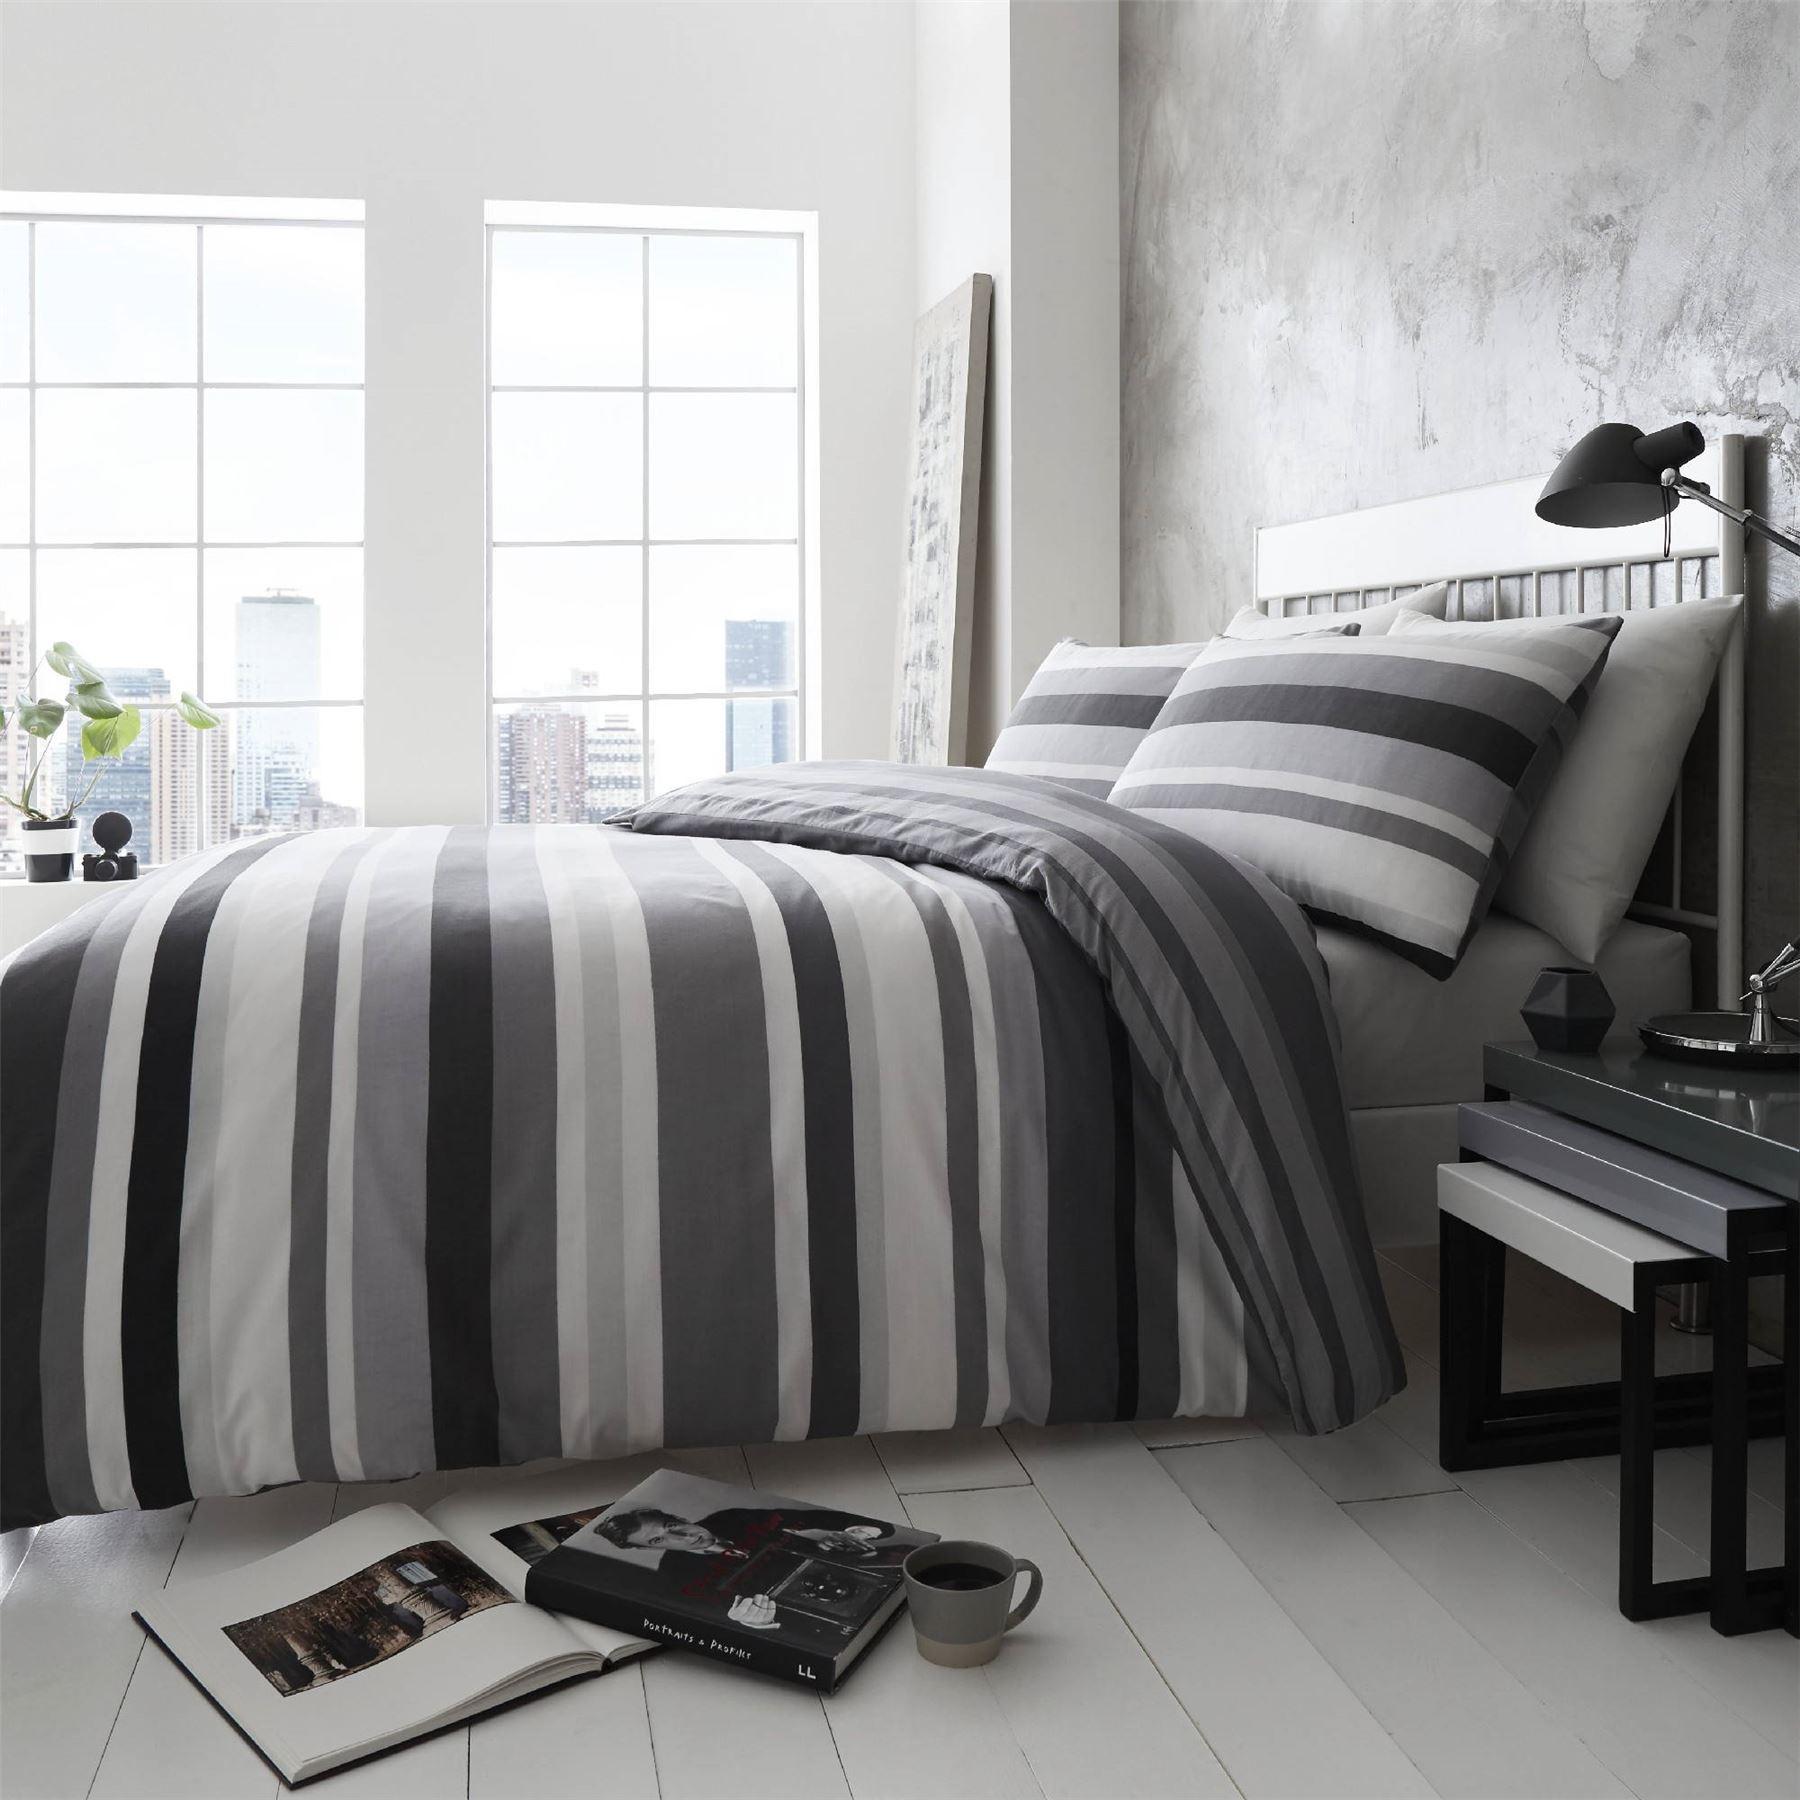 Hlc Simply Stripes Black Charcoal Grey White Reversible Duvet Cover Bedding Set Ebay